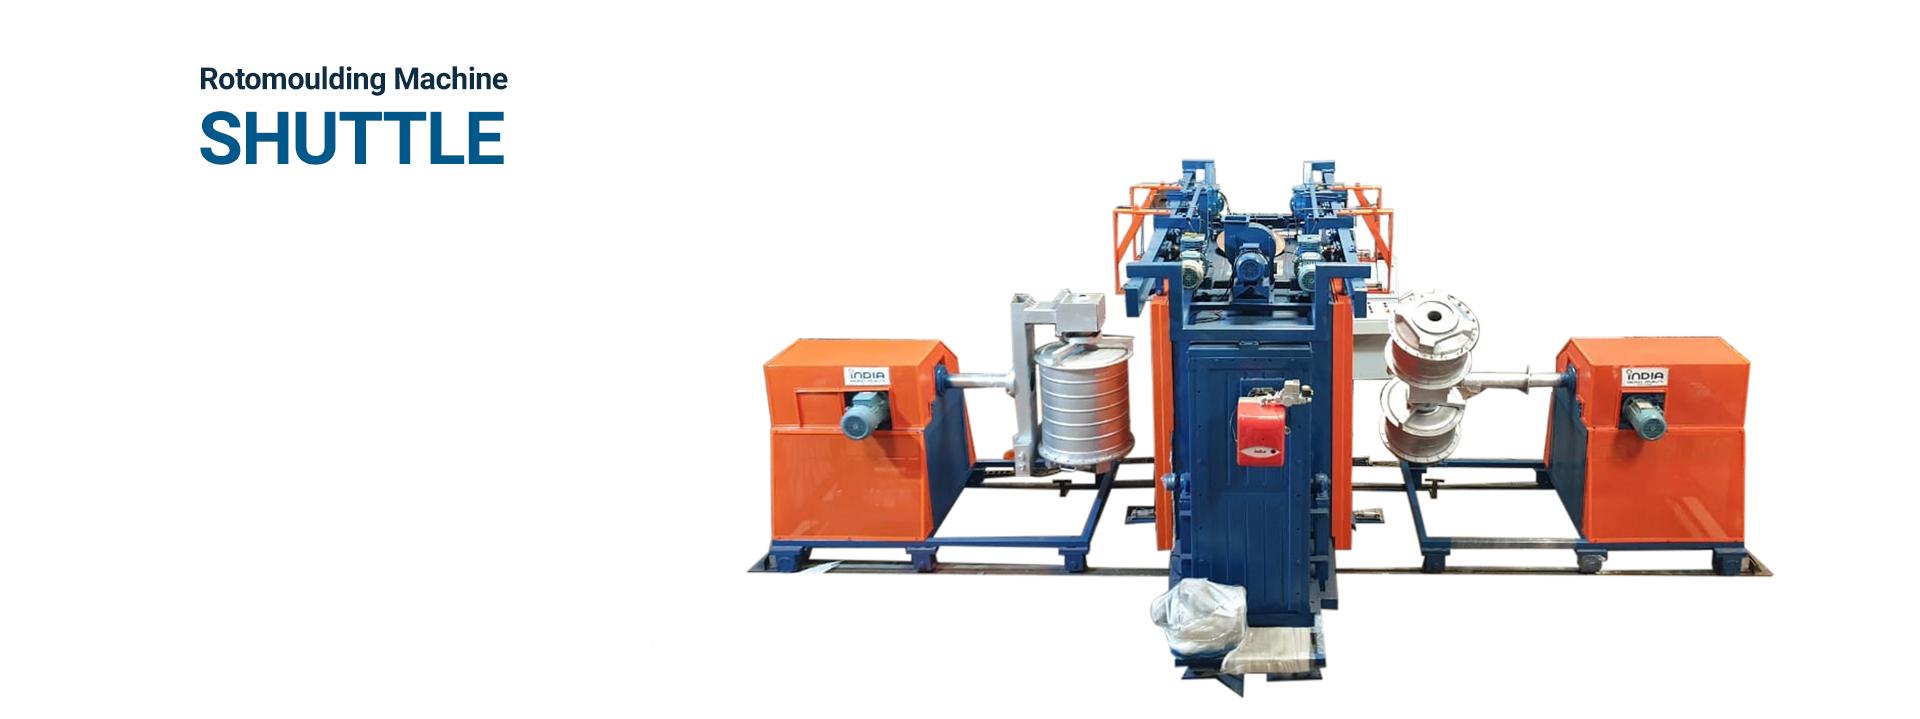 Shuttle Rotomolding Machine Supplier in IndiaShuttle Rotomolding Machine